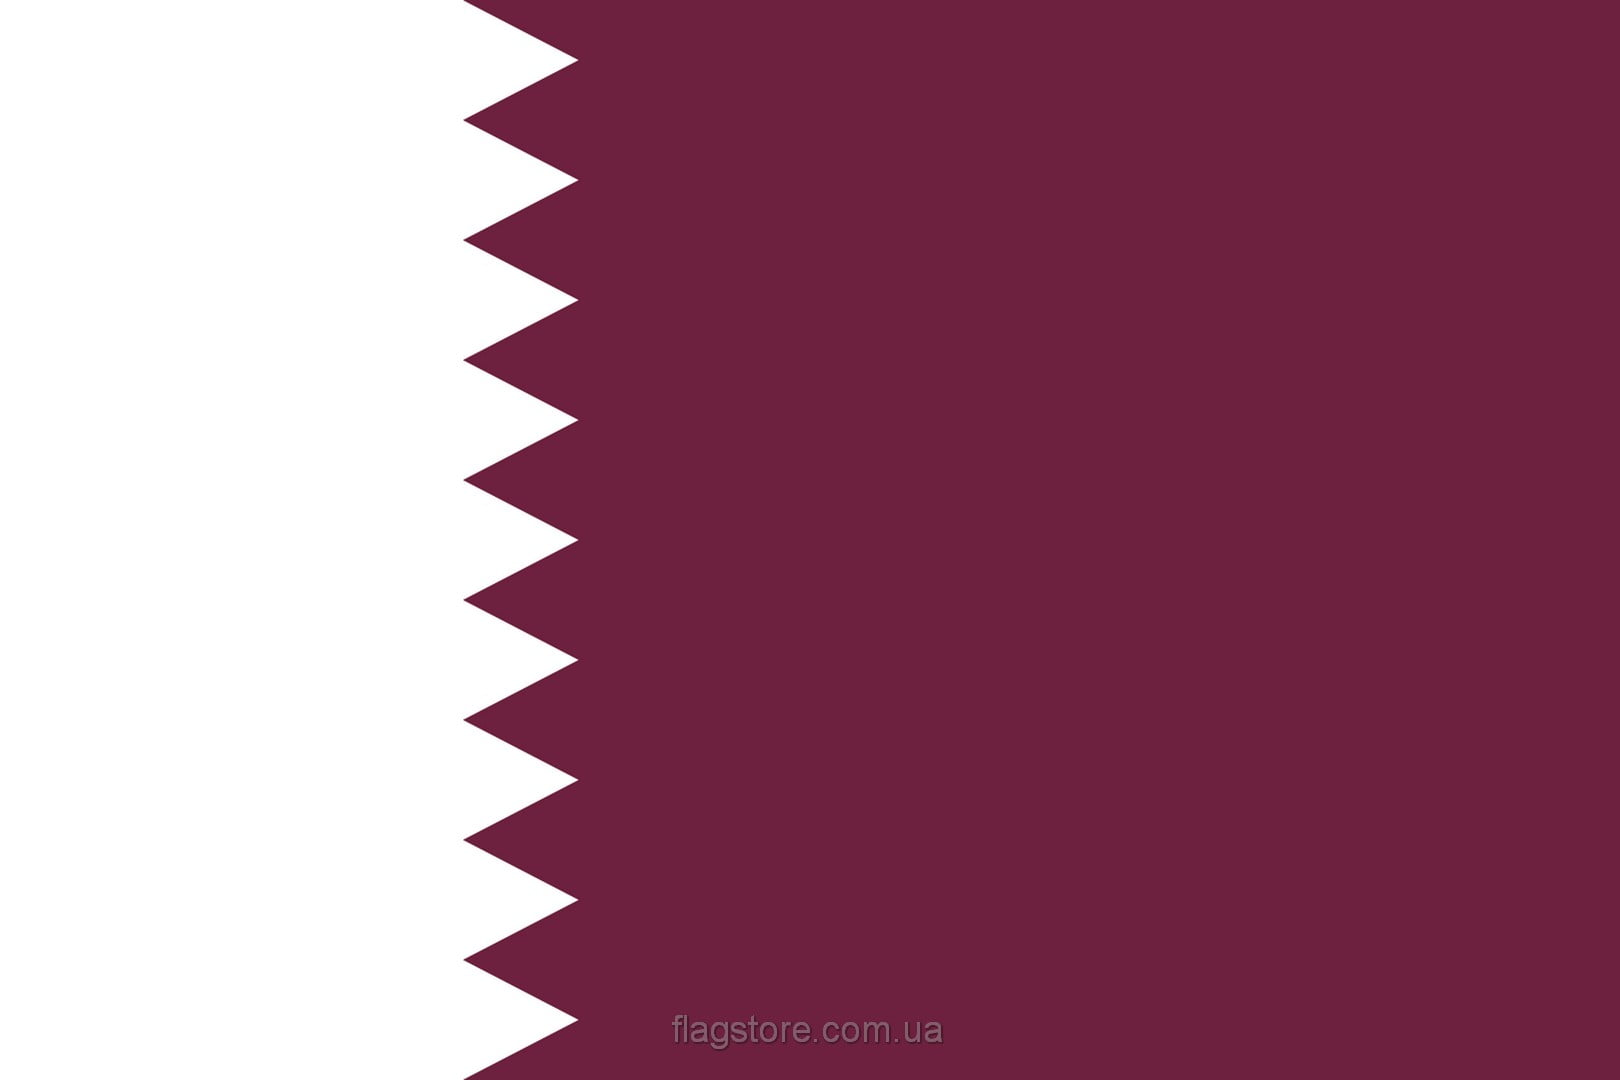 Купить флаг Катара (страны Катар)